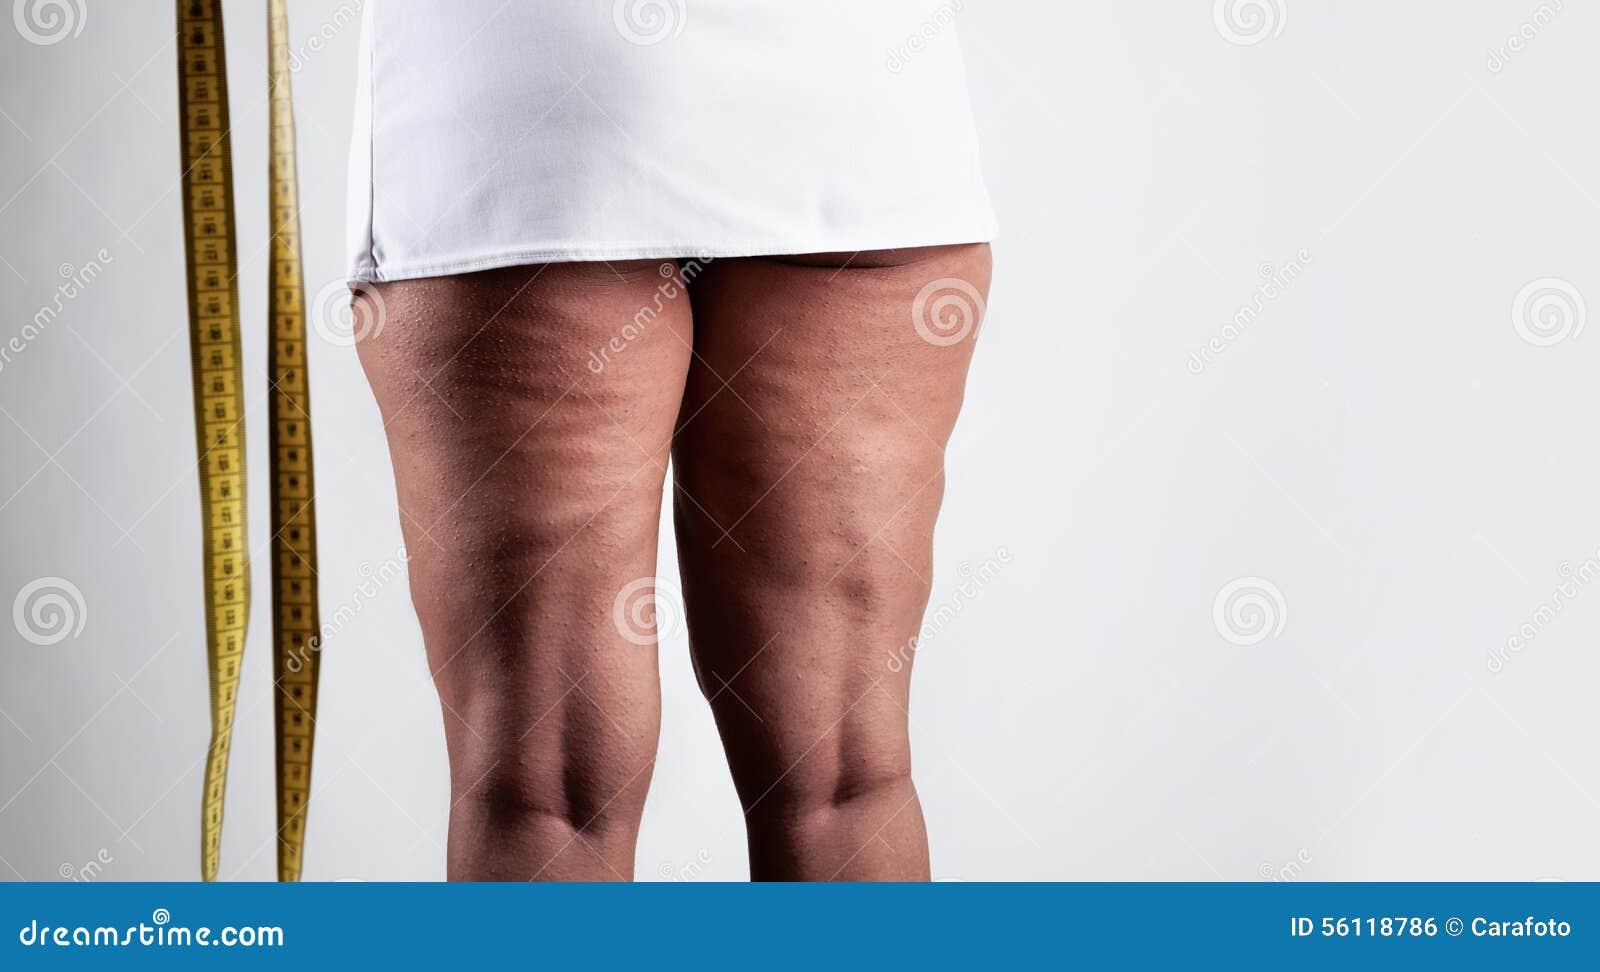 Mujer joven con celulitis